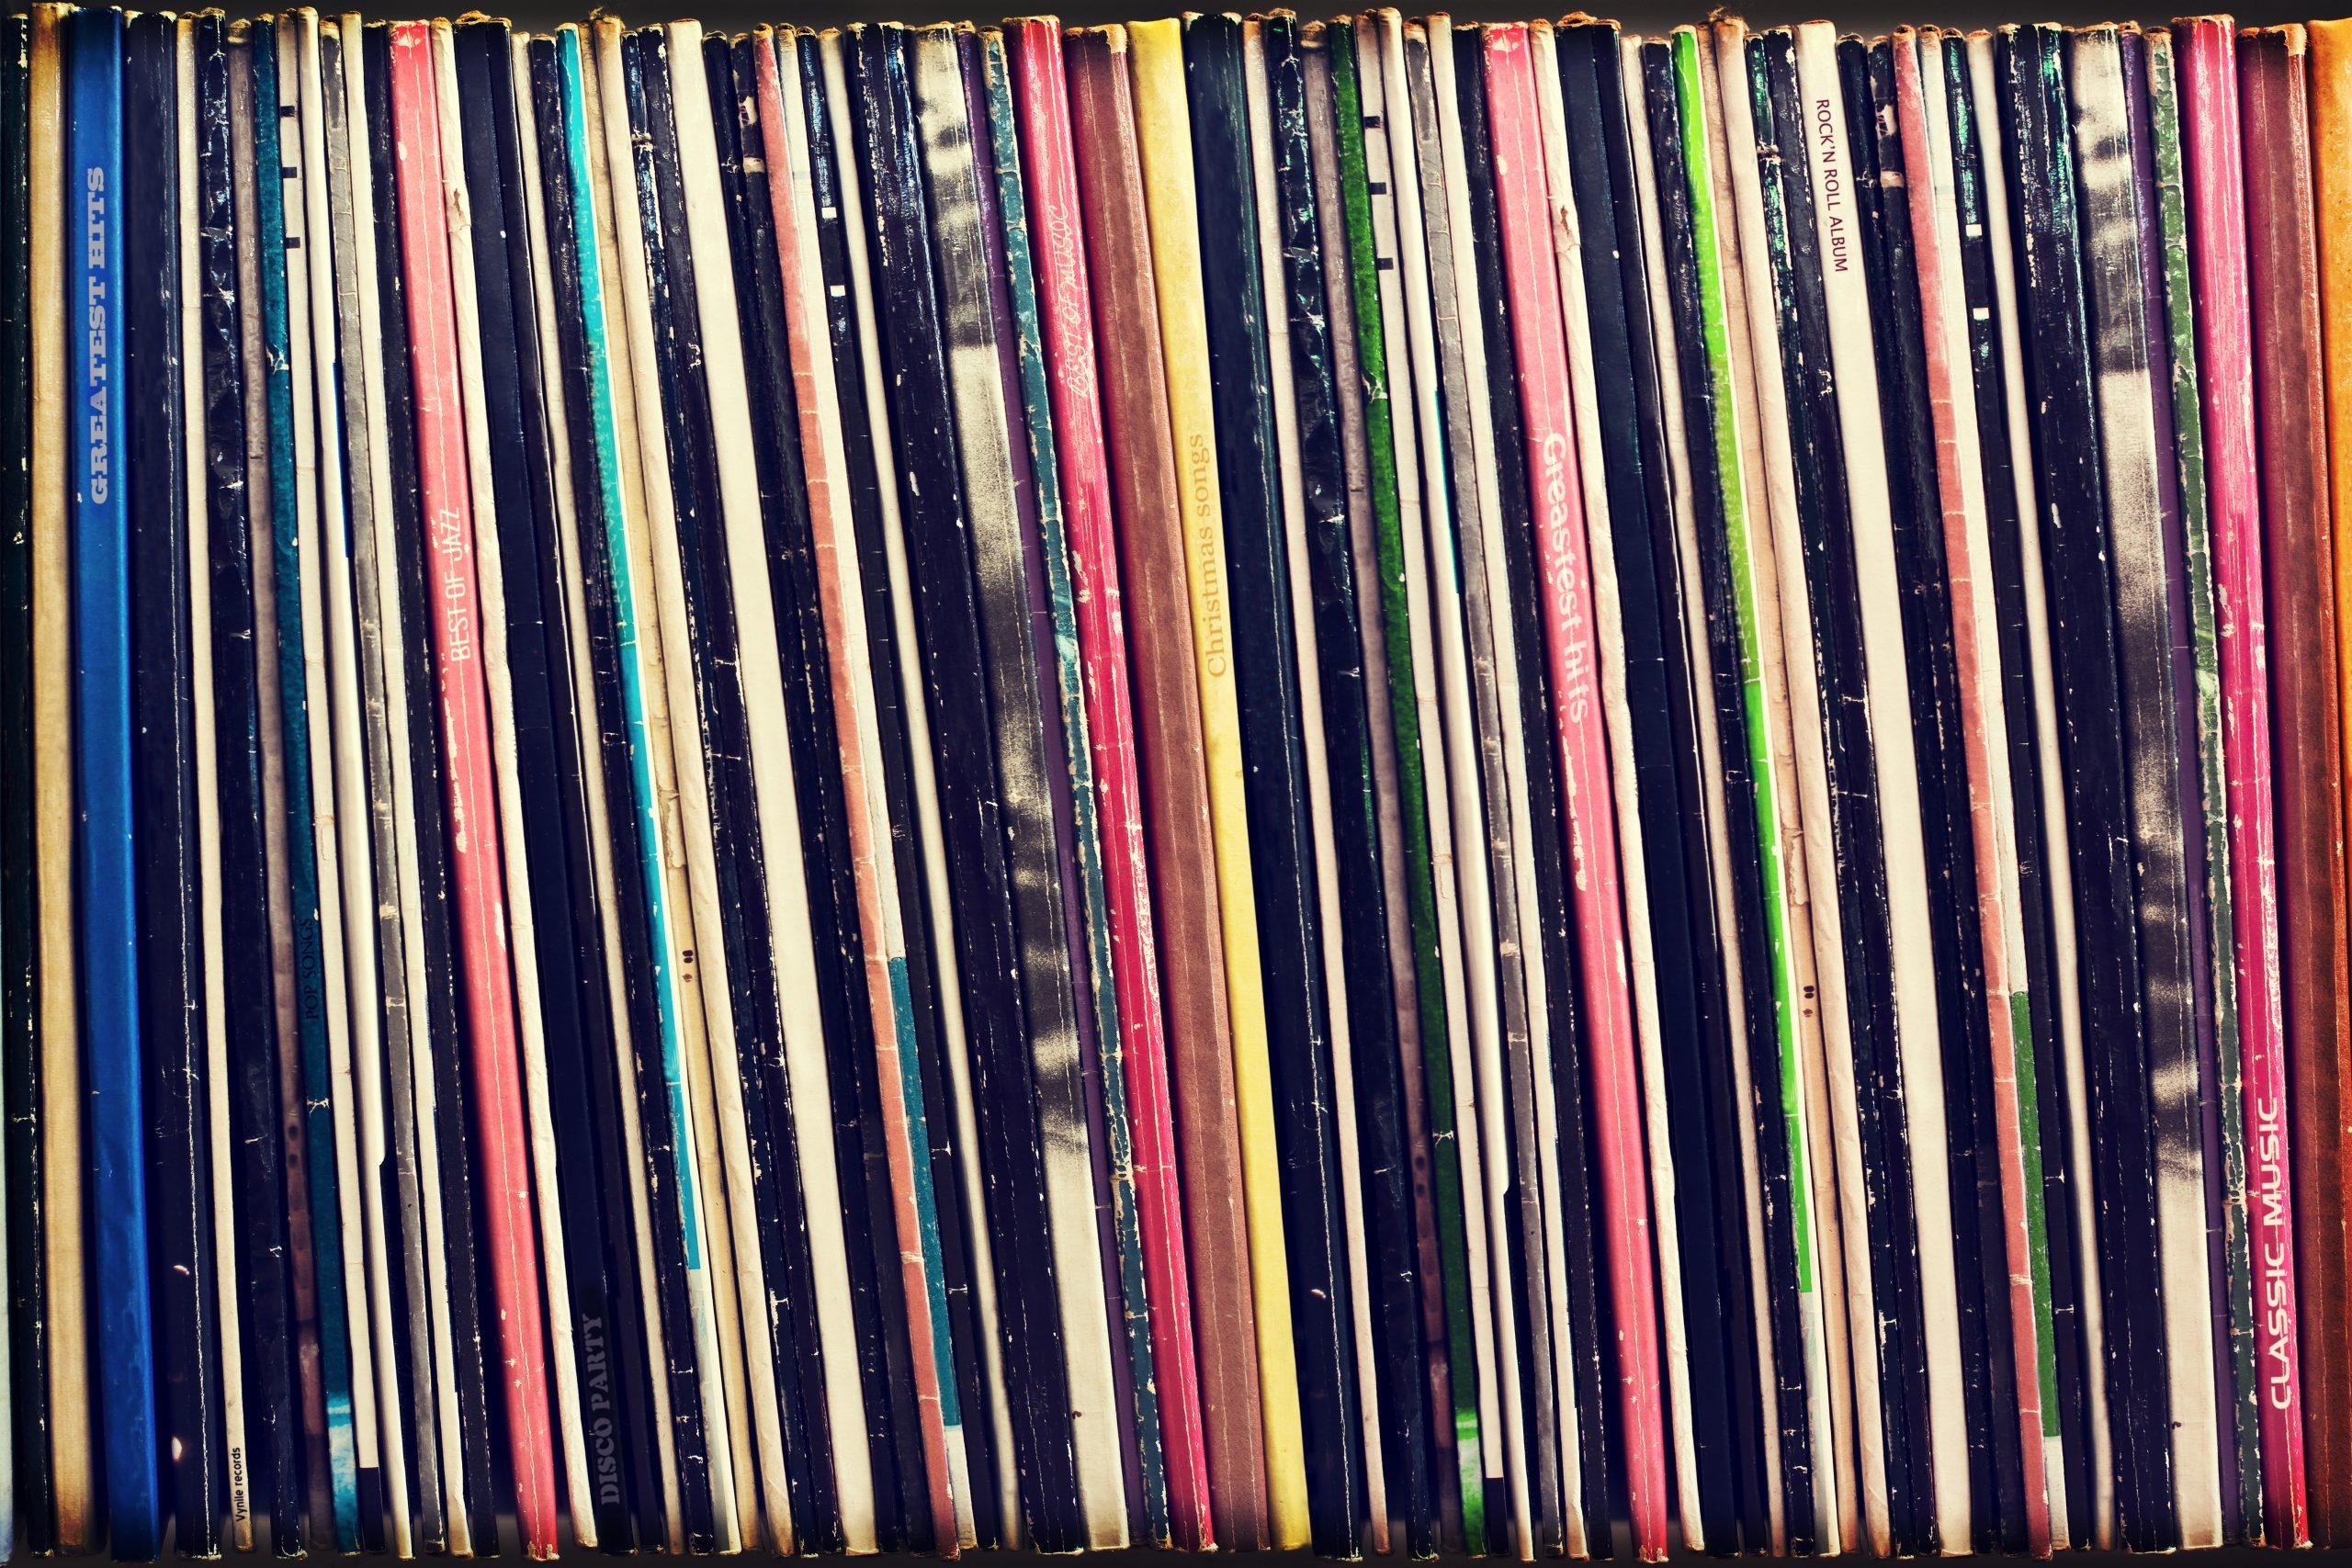 Album covers on a shelf